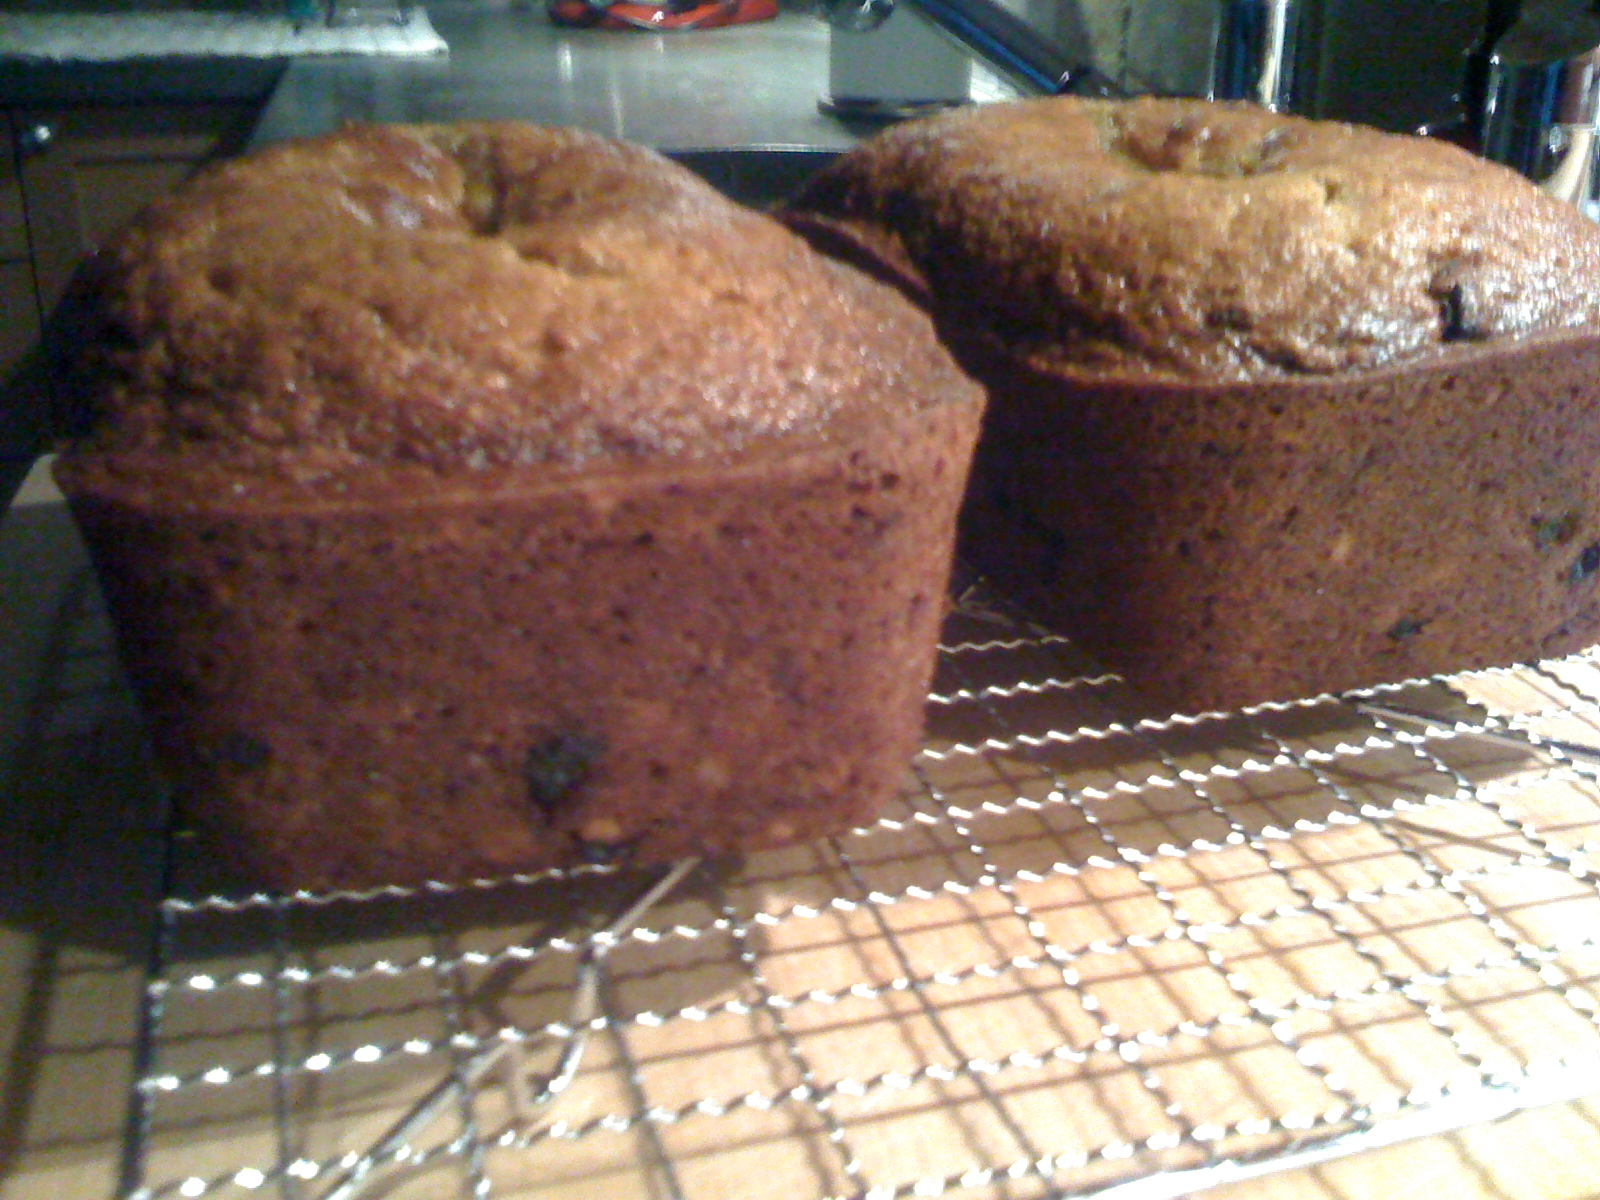 Butternut Squash bread baked